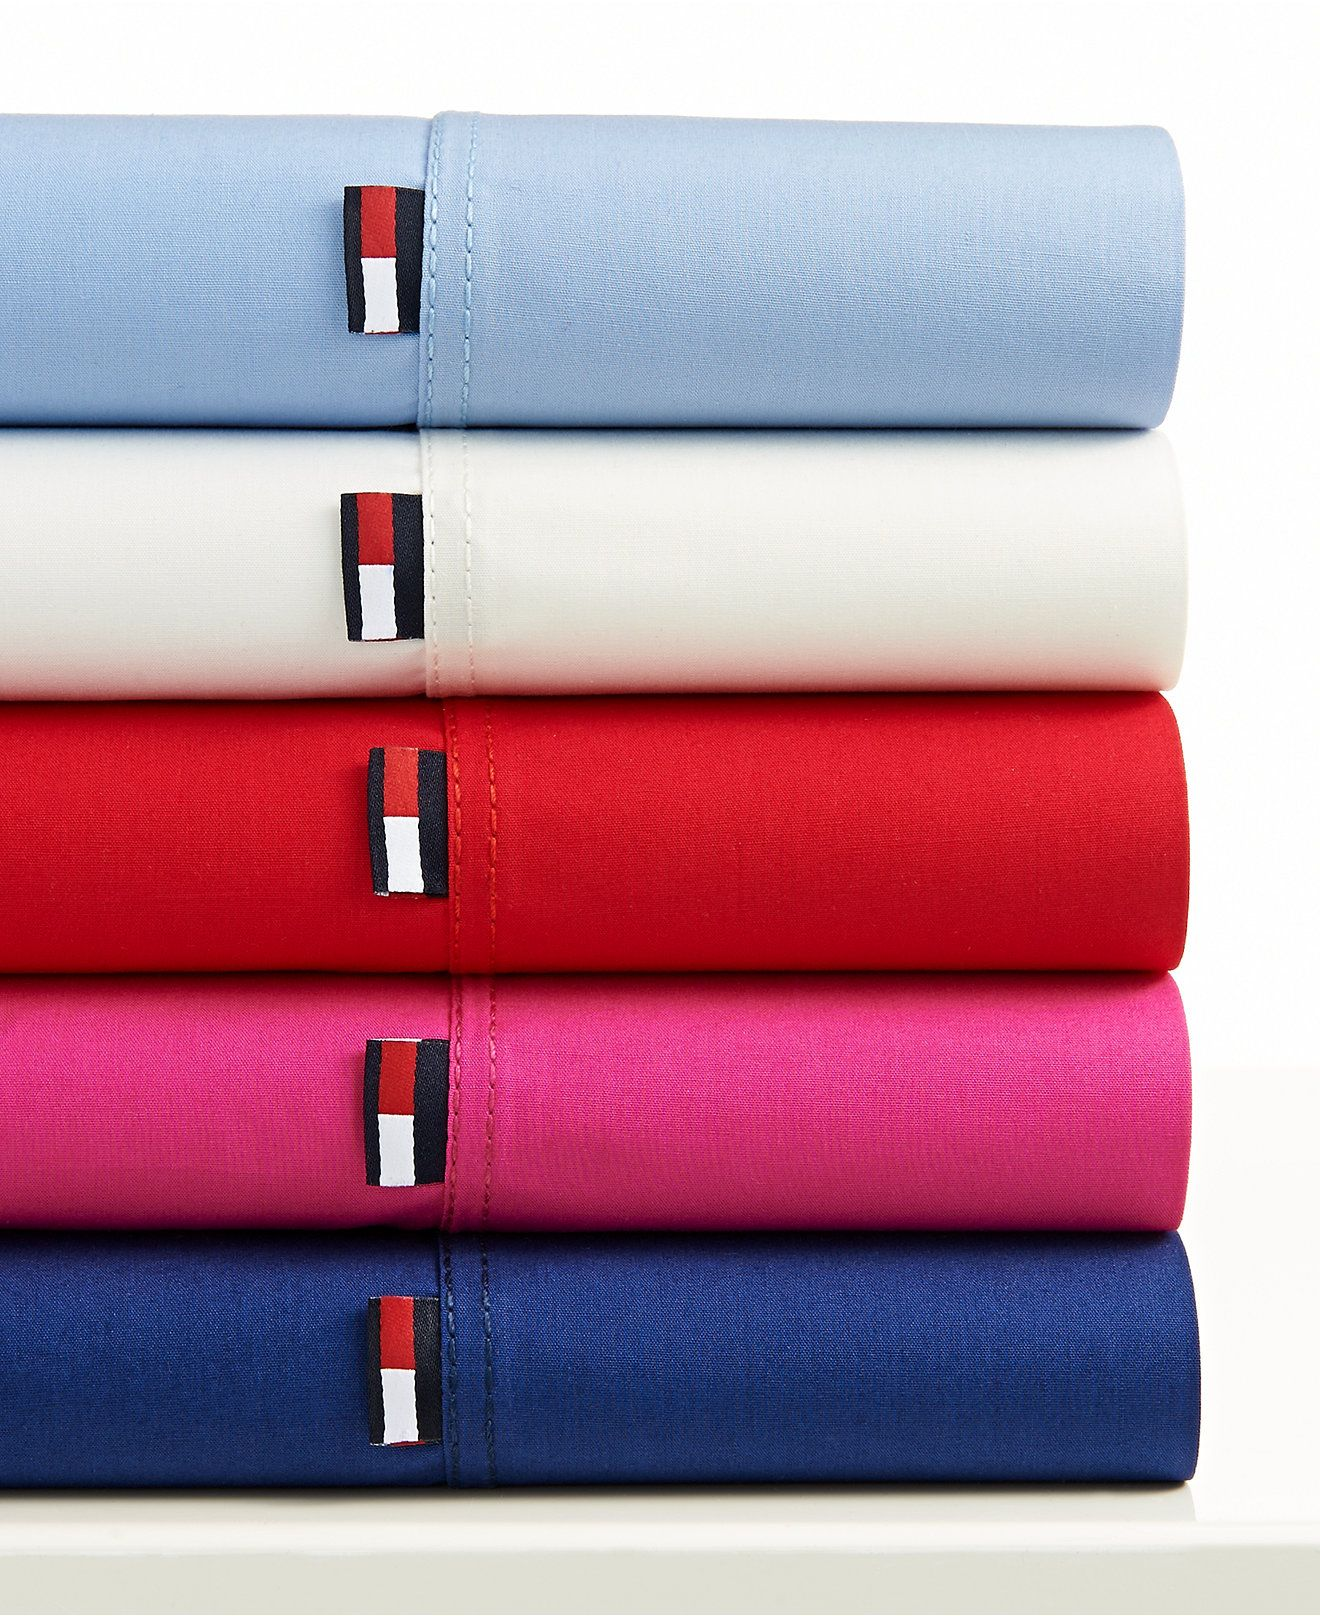 Tommy Hilfiger Solid Core Twin XL Sheet Set   Twin xl ...